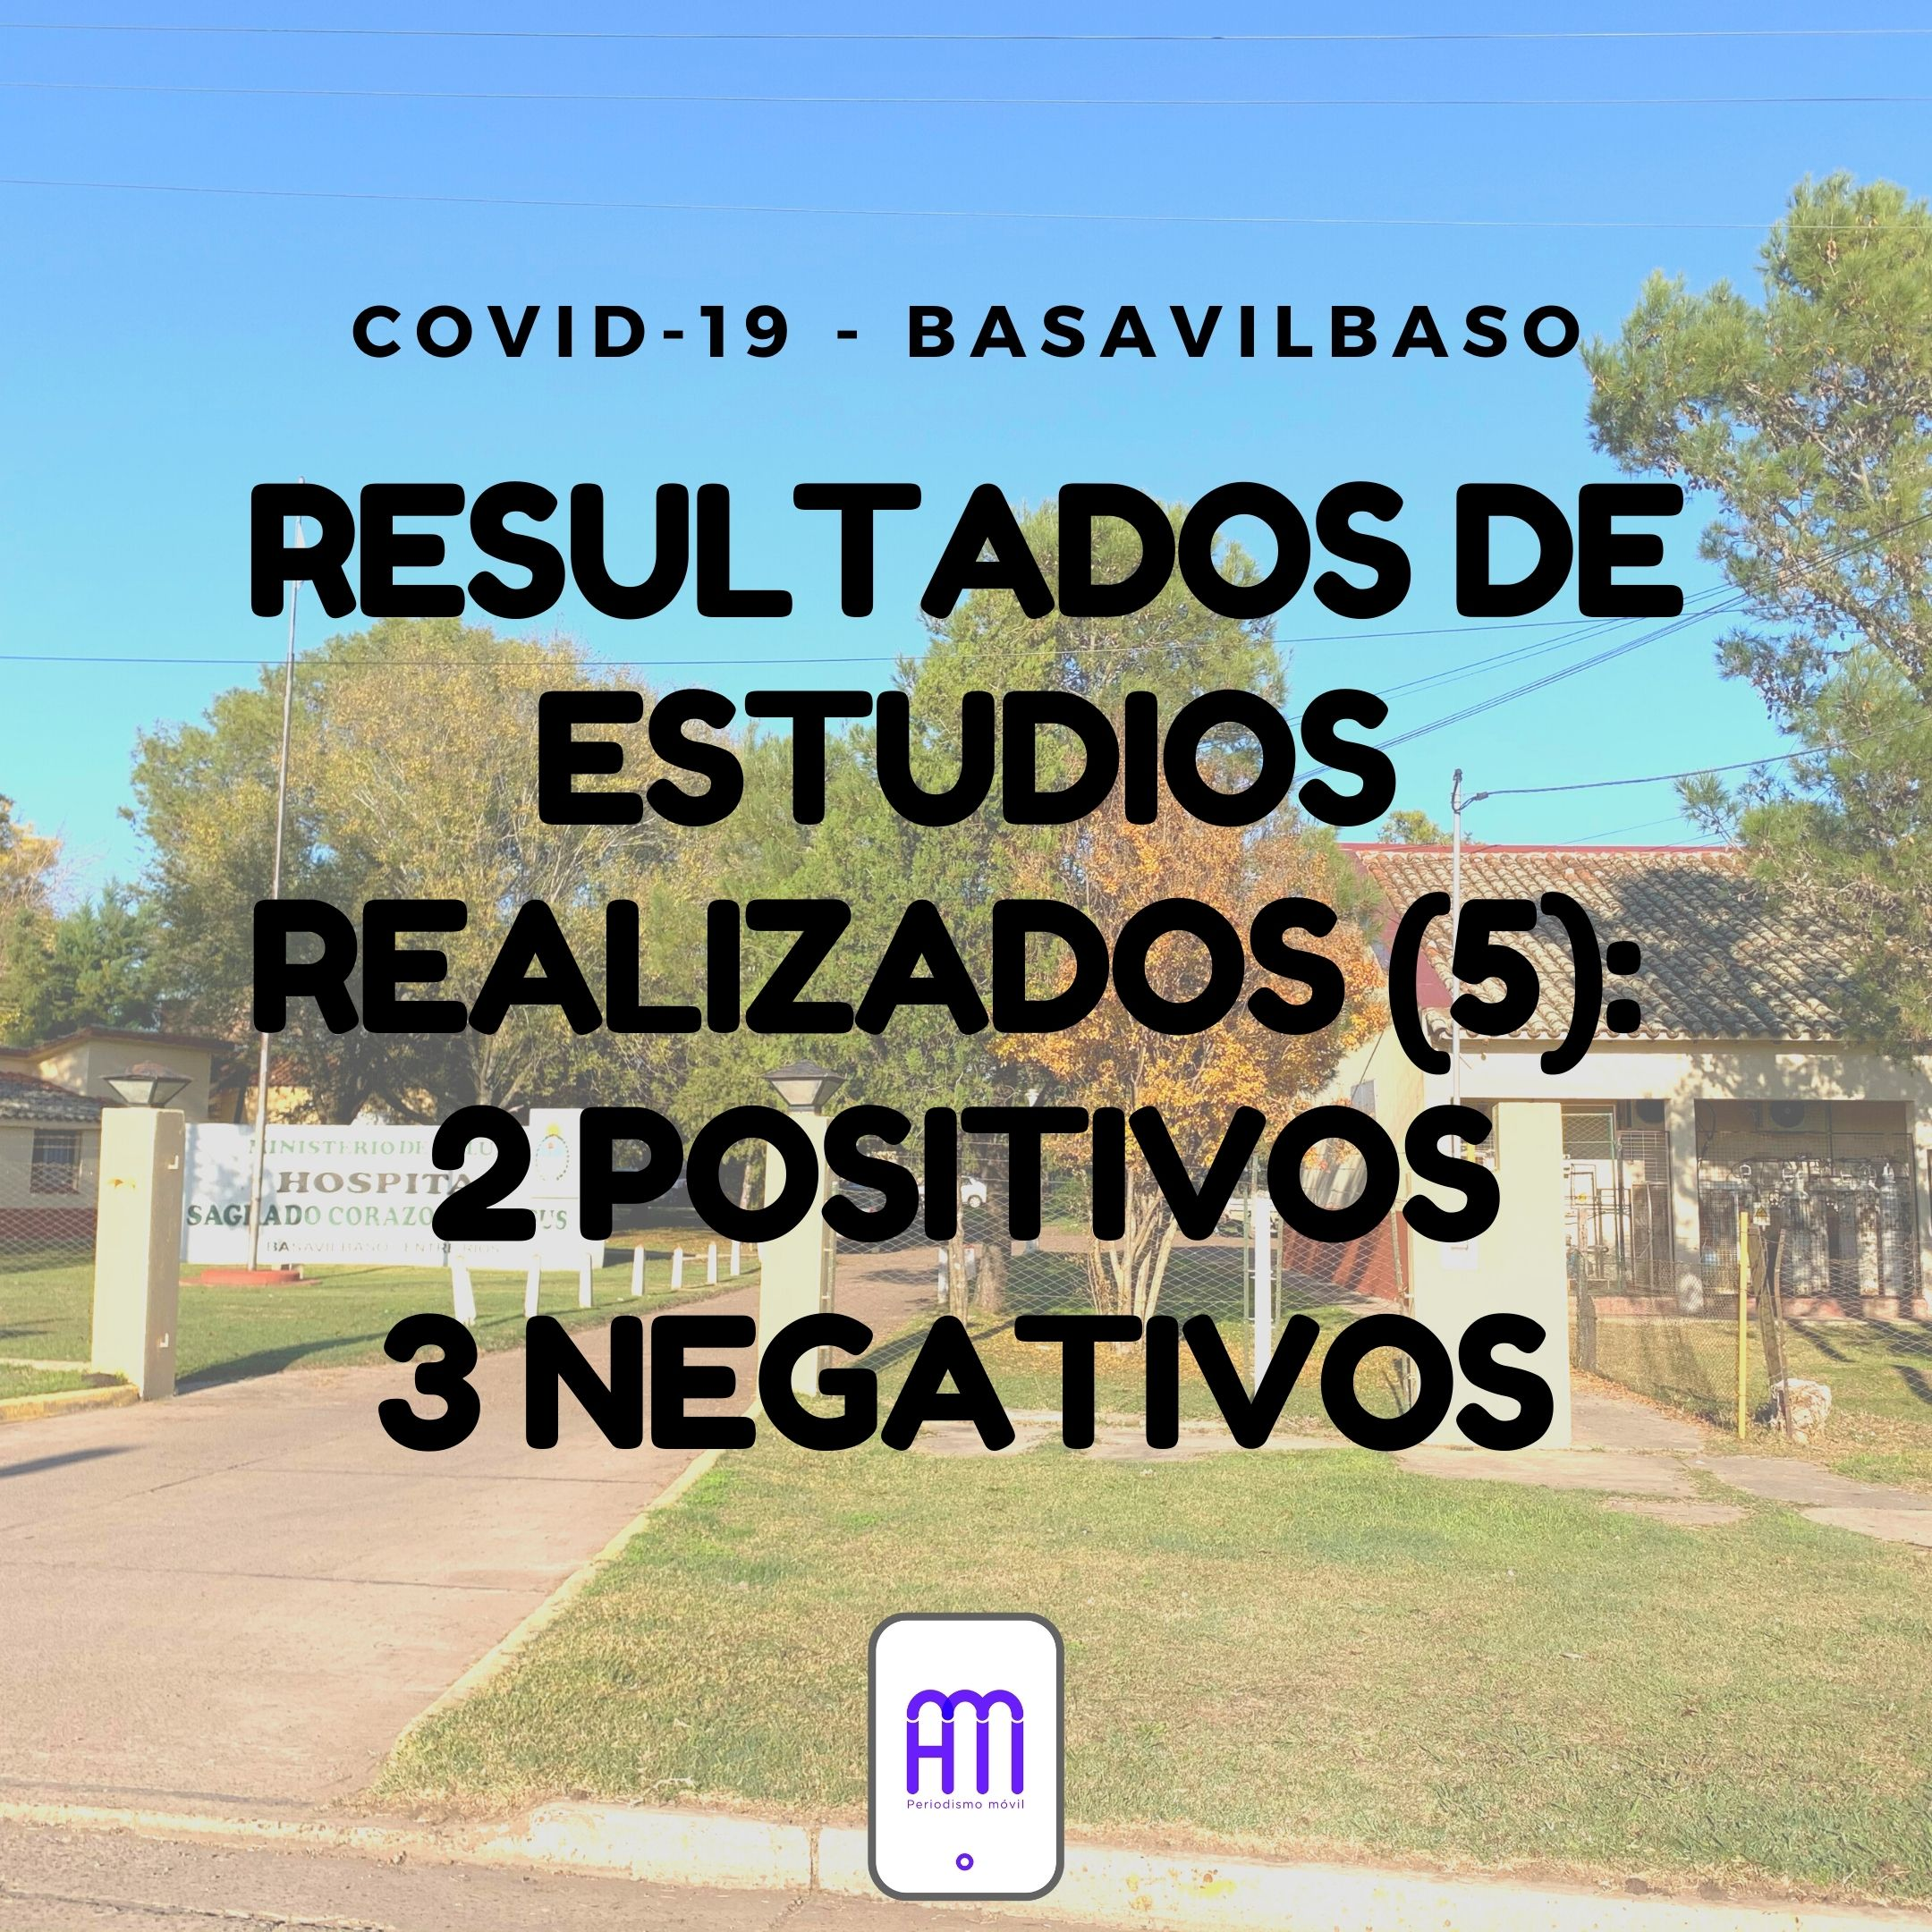 Covid-19: este jueves se sumaron dos nuevos casos en Basavilbaso